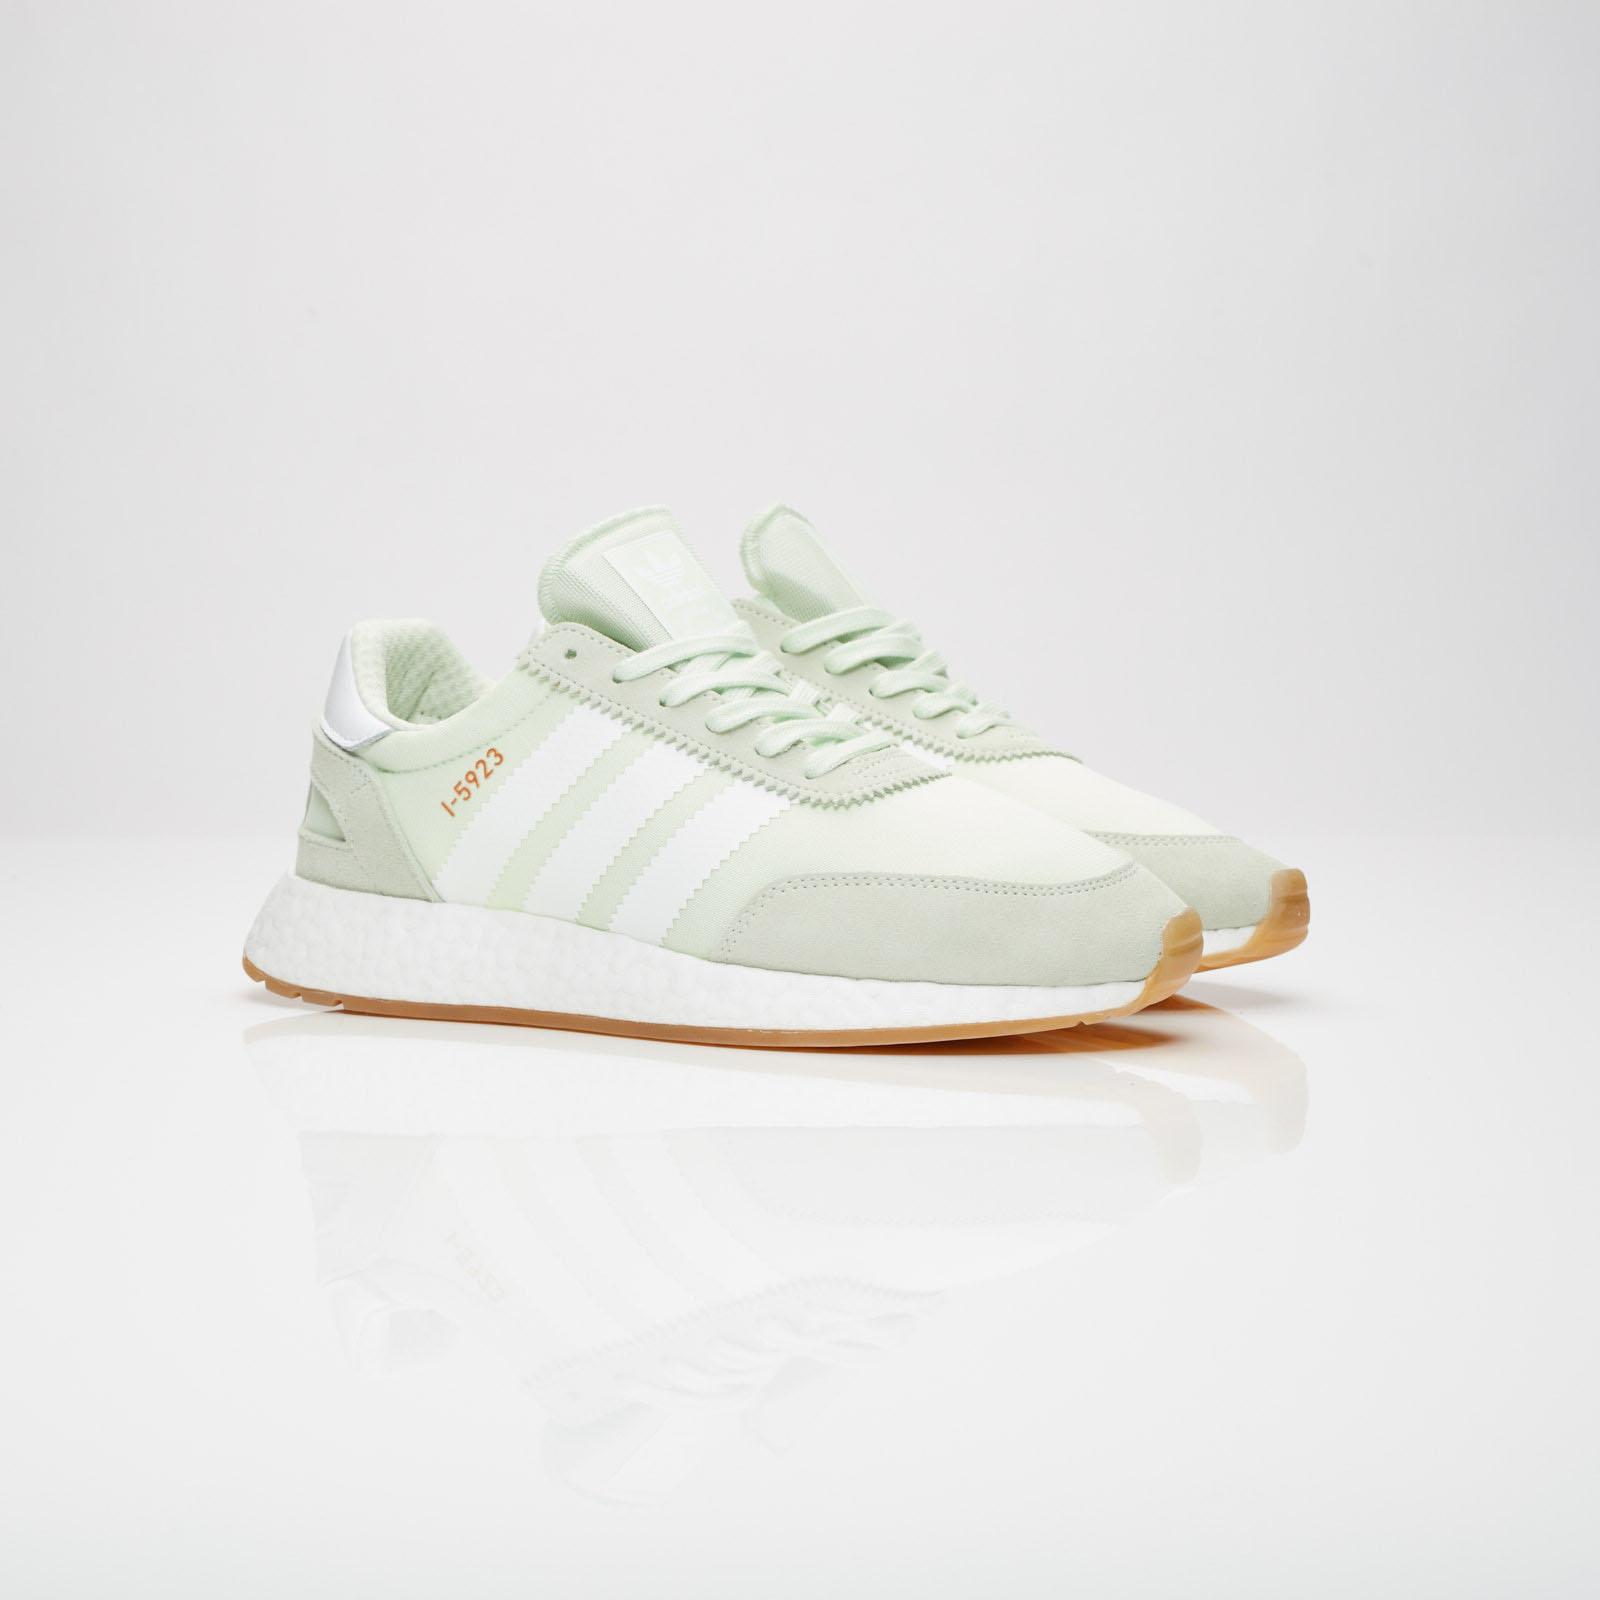 fa3eafda6 adidas I-5923 - Cq2530 - Sneakersnstuff